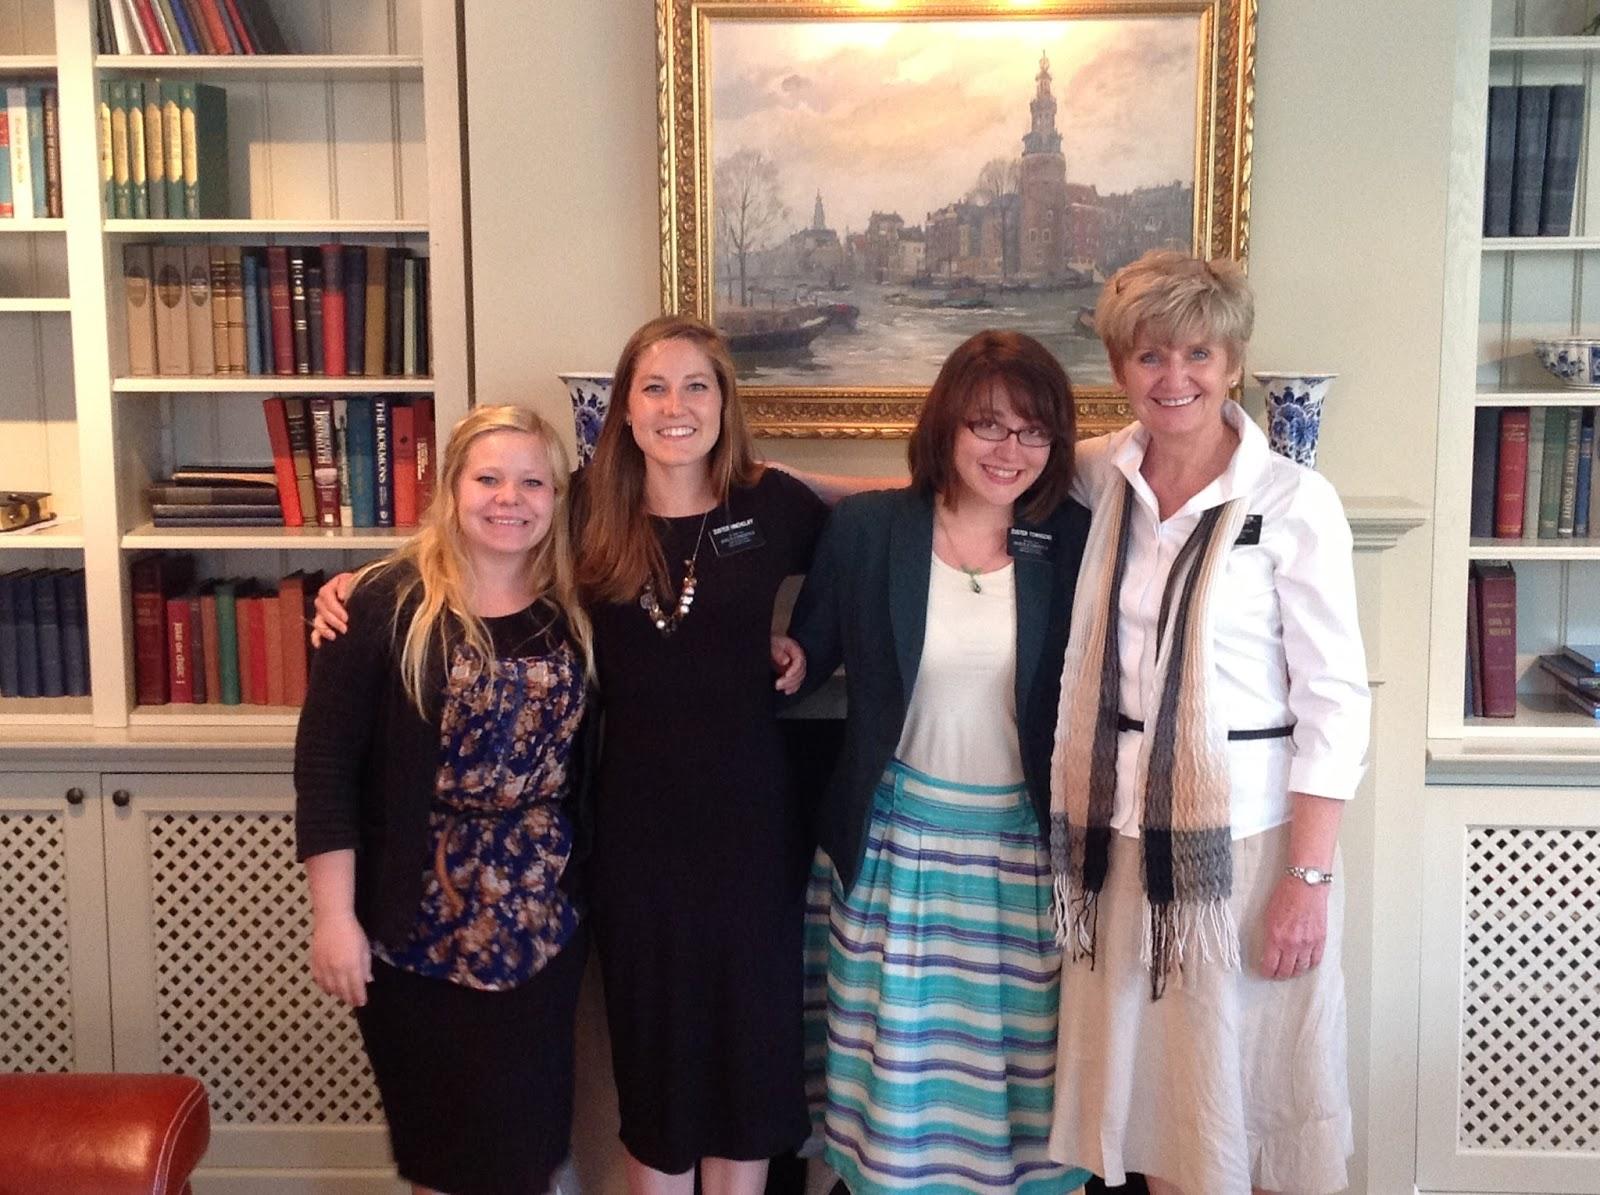 Belgium Netherlands Mission: We lose Three Sister Missionaries